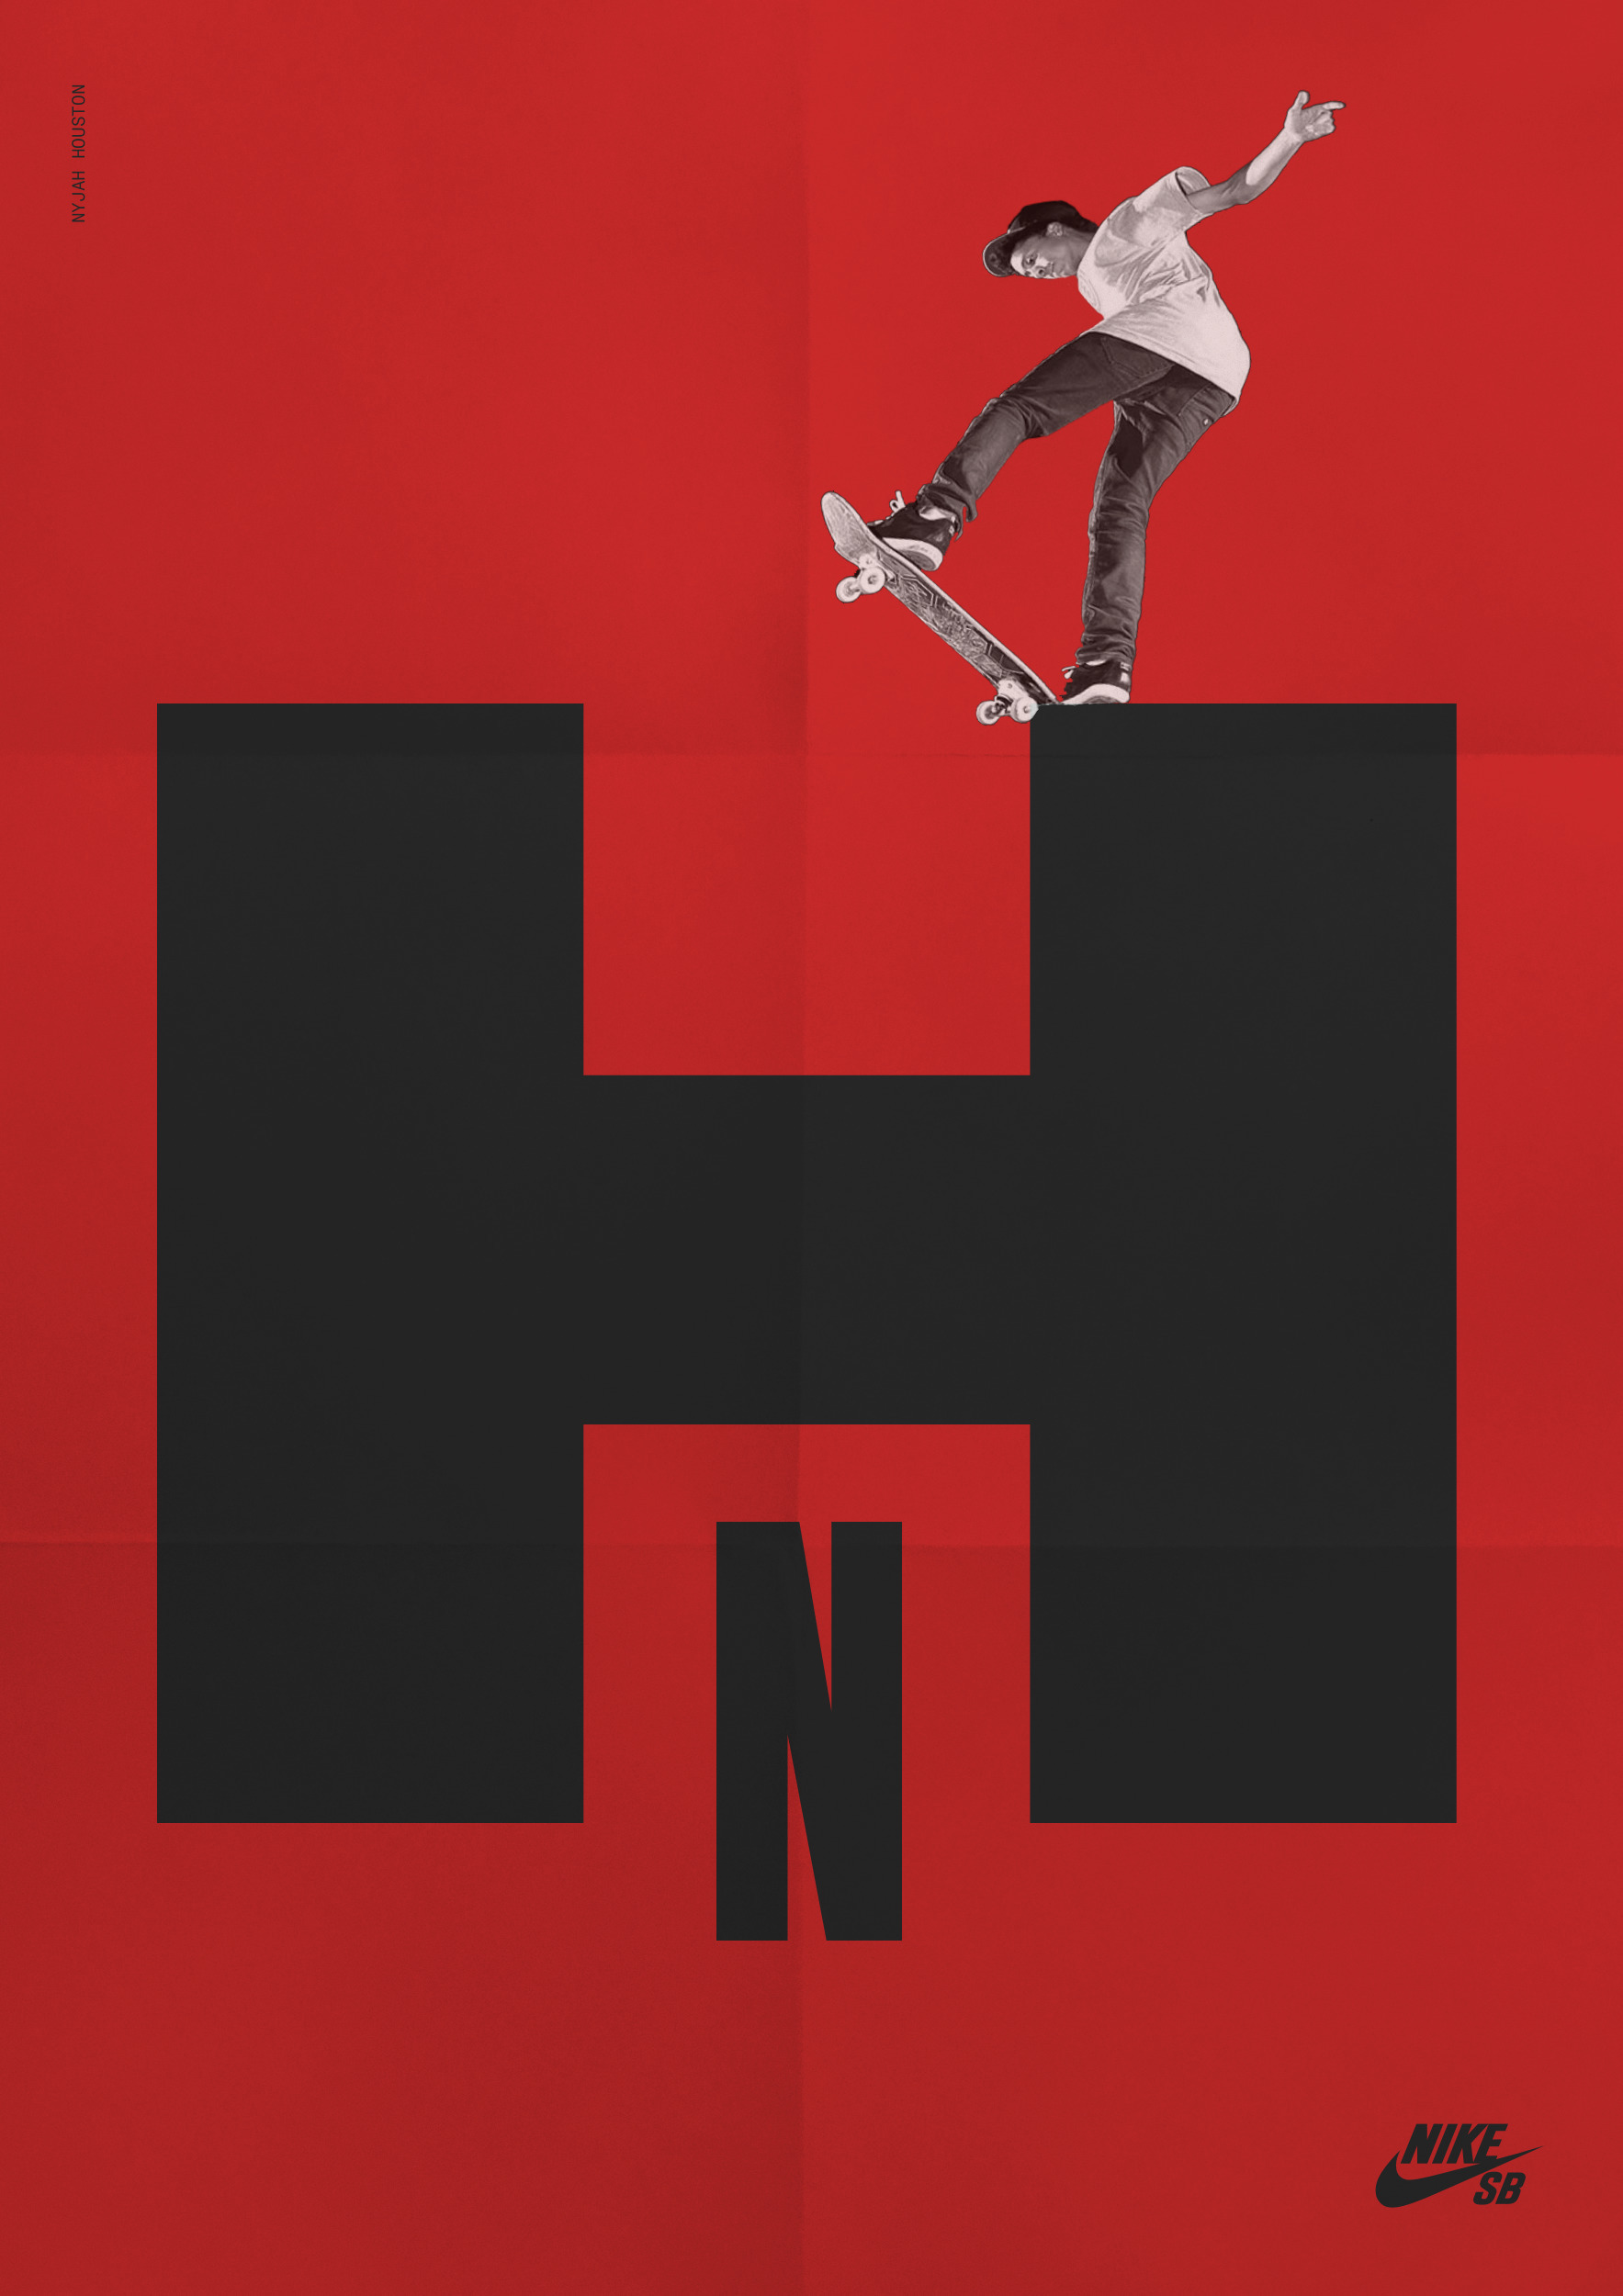 Nyjah Huston. Nike SB - luiscoderque | ello